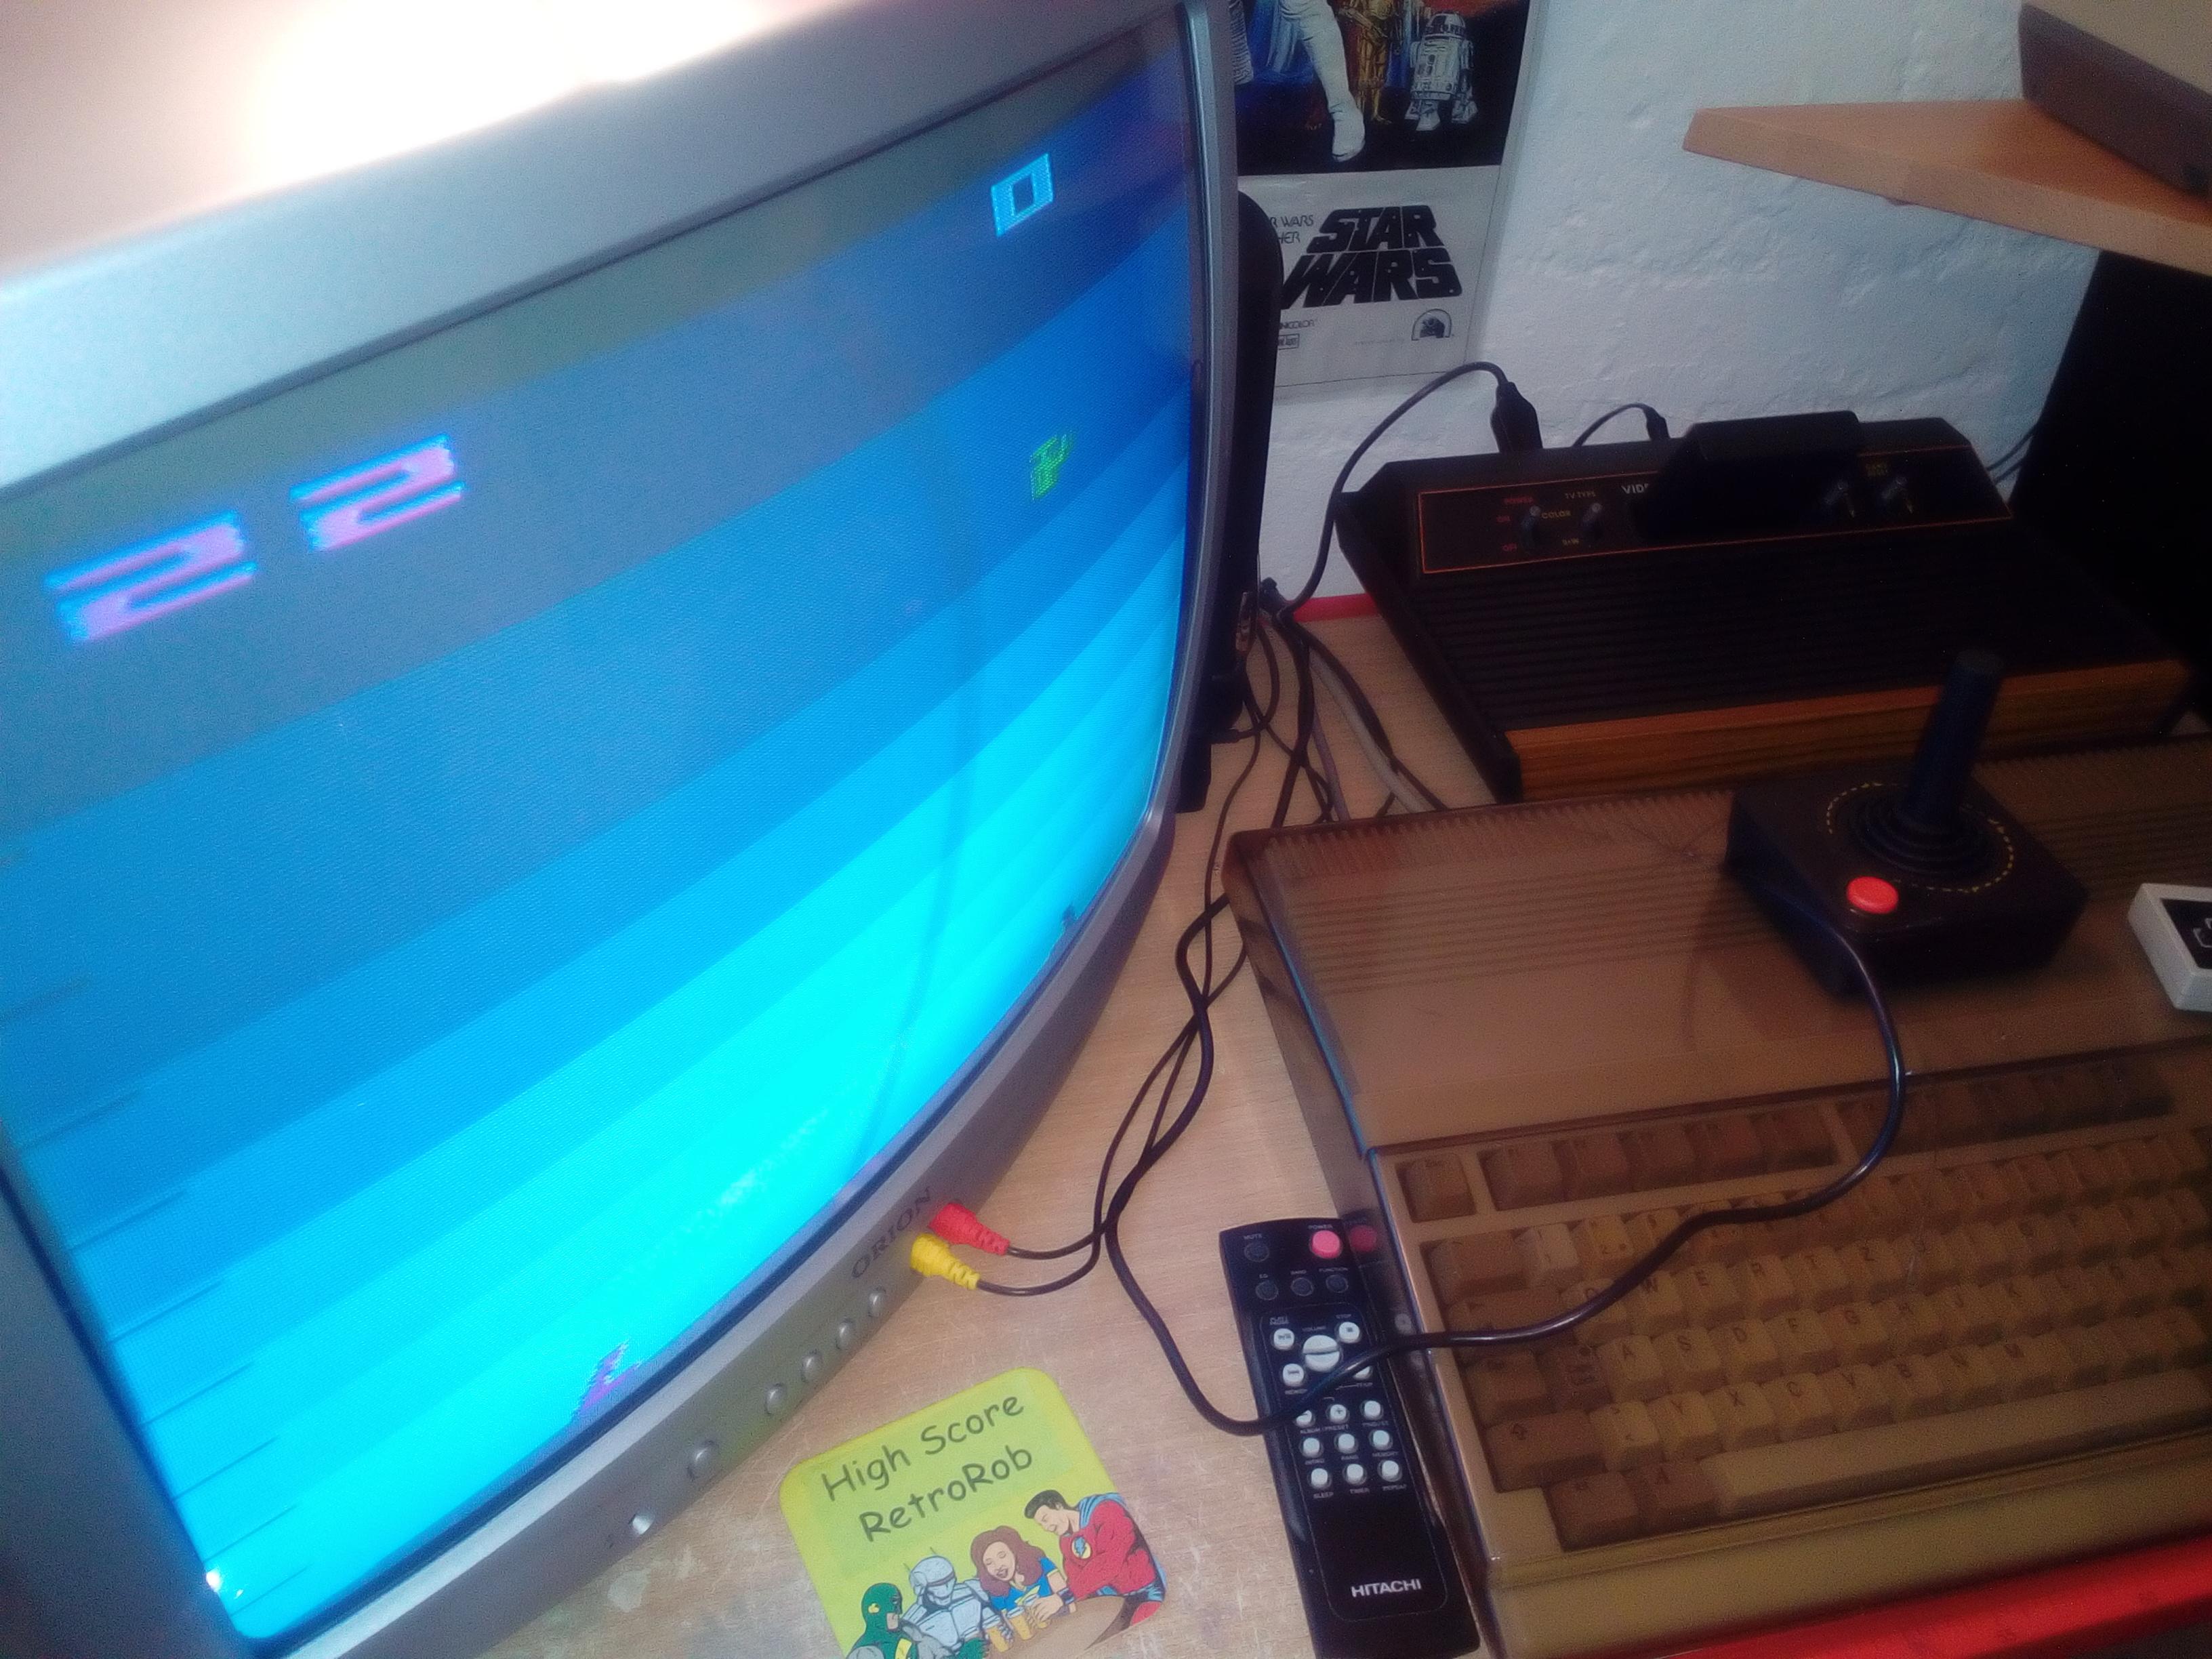 RetroRob: Air-Sea Battle (Atari 2600 Novice/B) 22 points on 2018-04-20 12:24:22